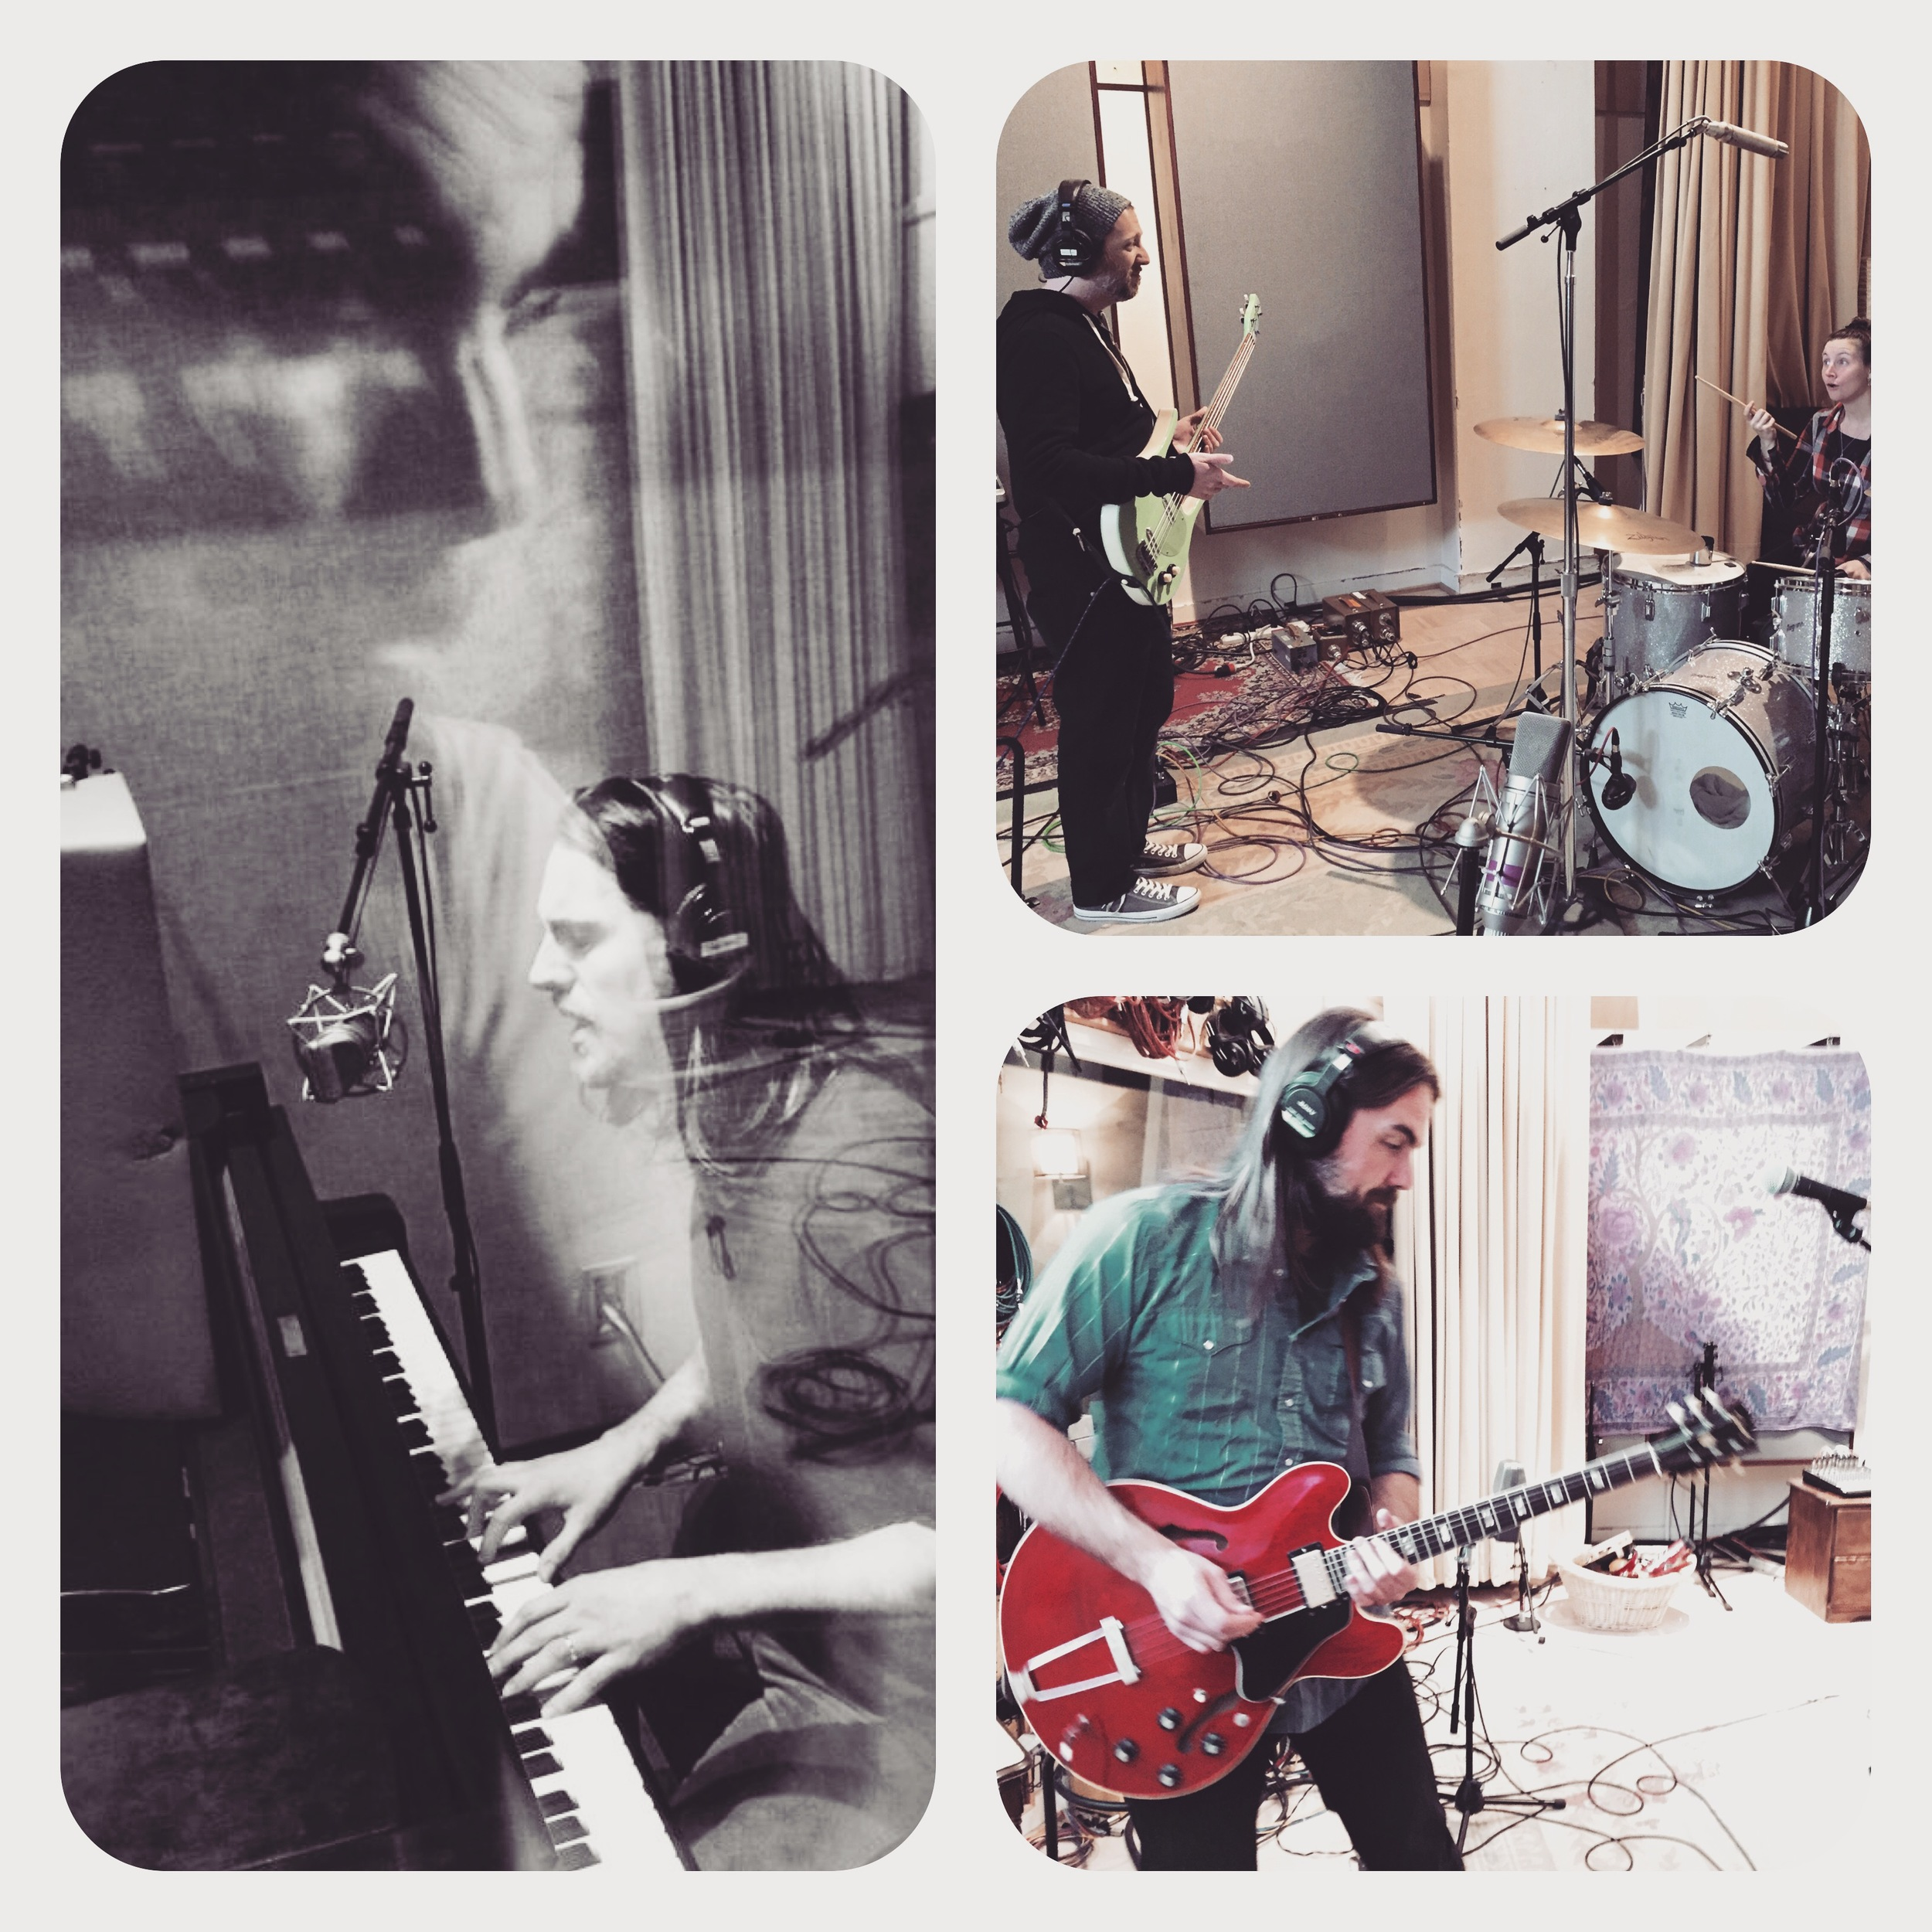 M&M RECORDING PIC 1.JPG